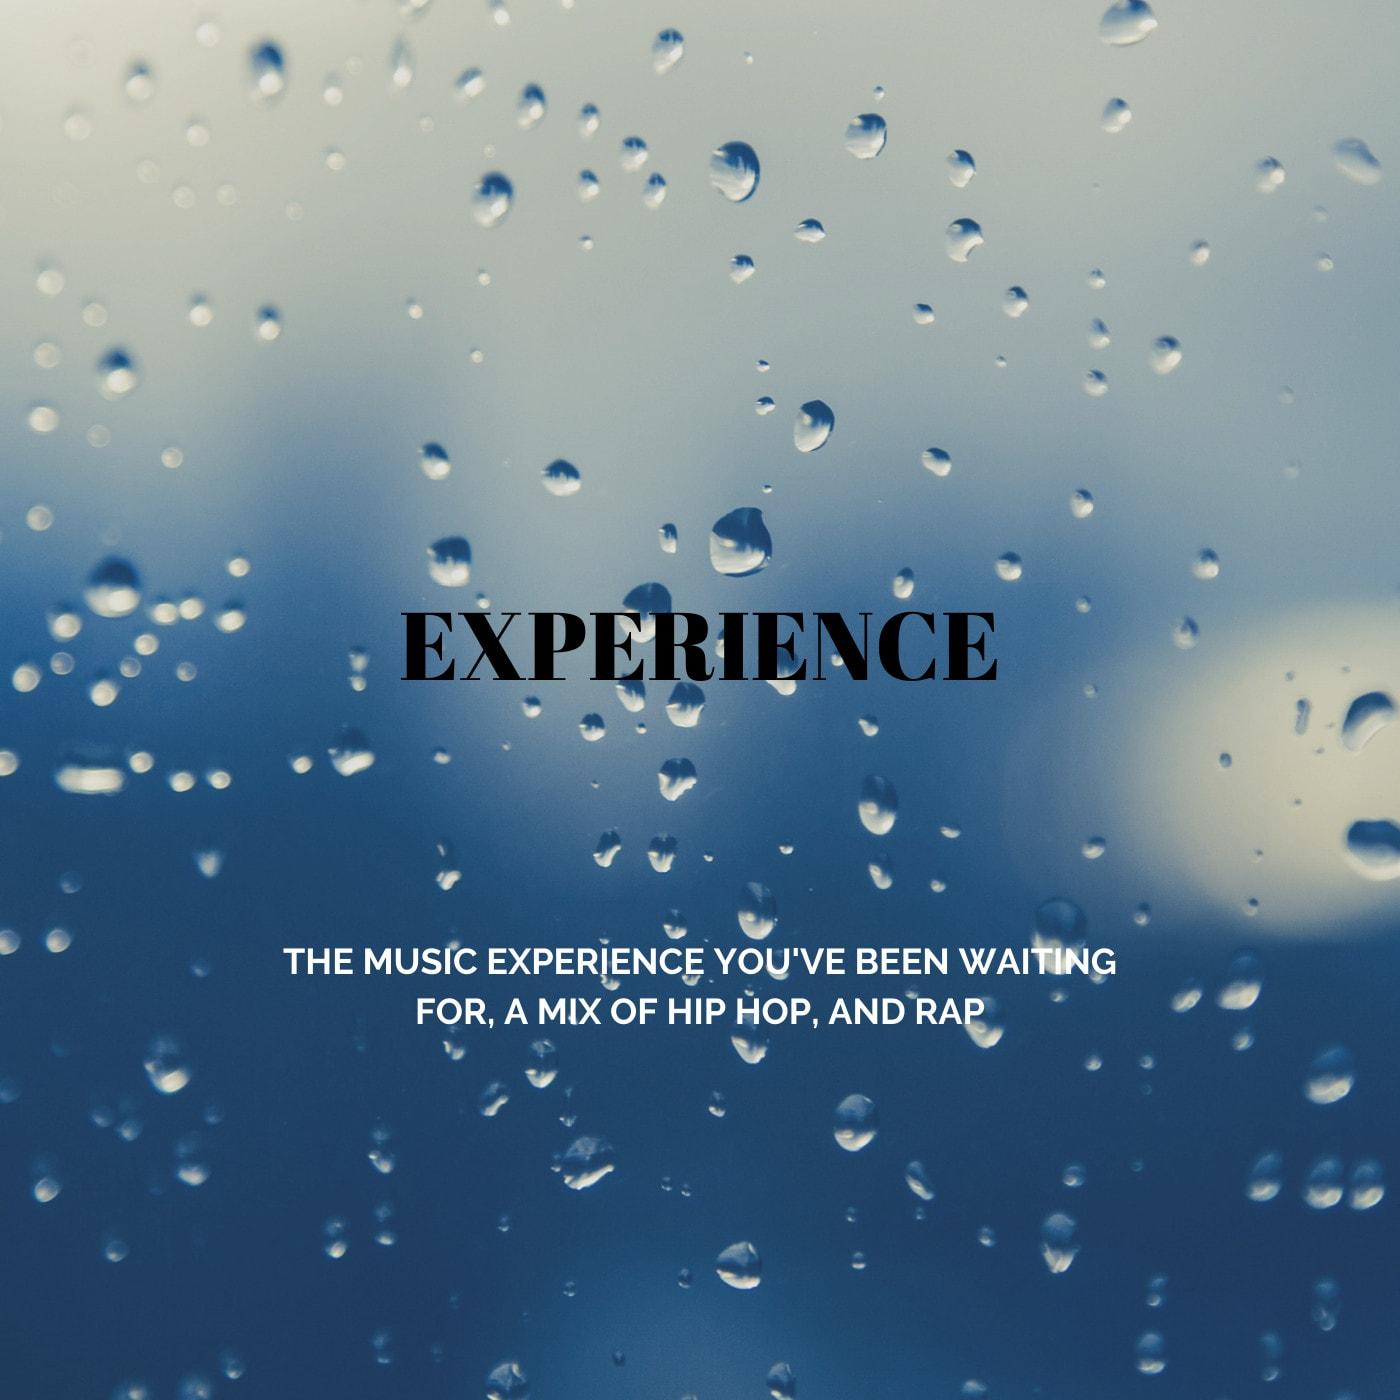 Aesthetic Album Cover Design By Poplogodesign